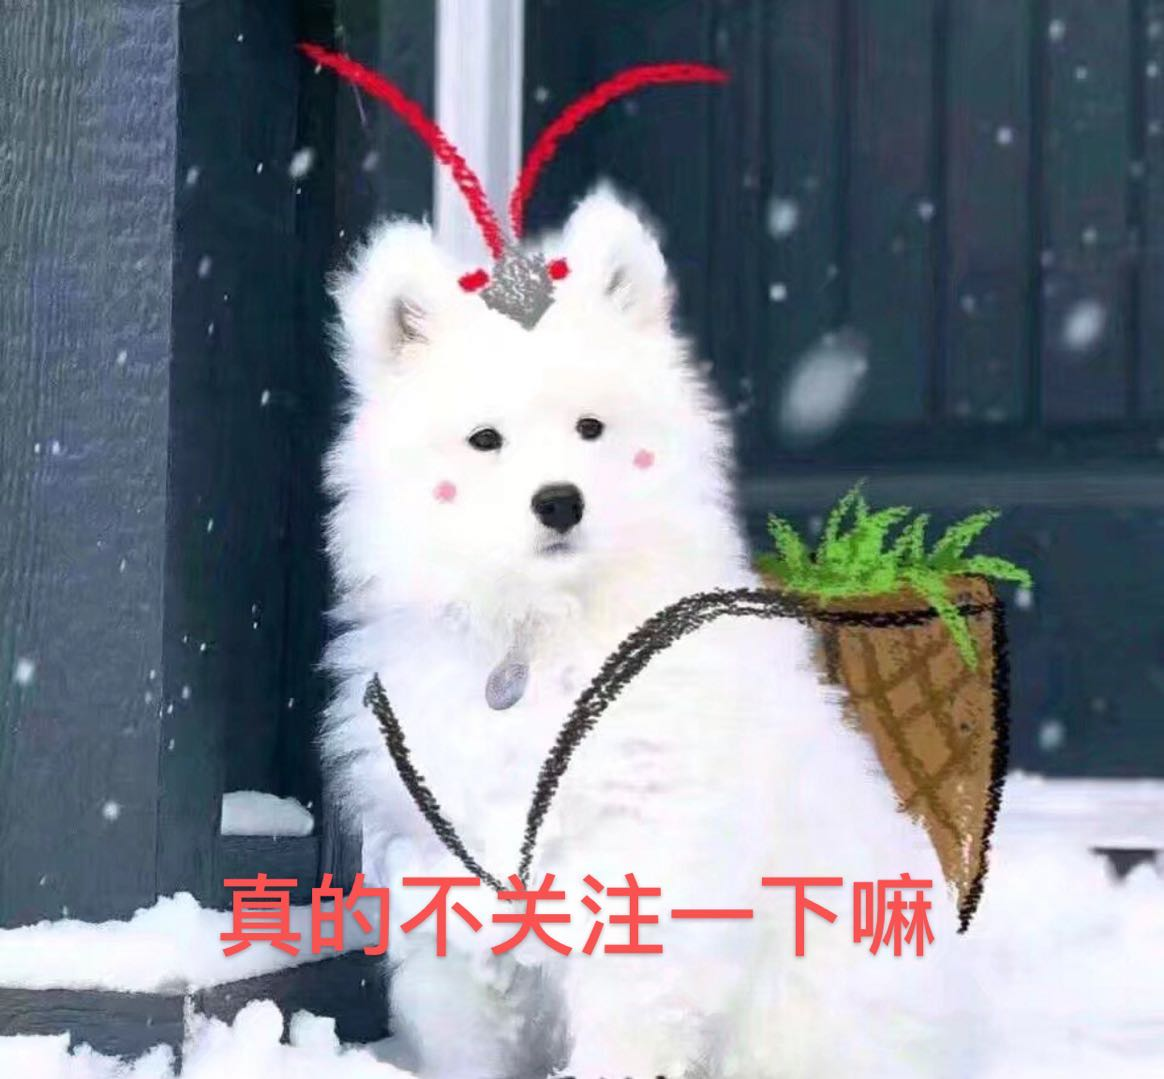 offer结局:王骁出国,何旻哲淘汰,丁辉逆袭成功重回君合?